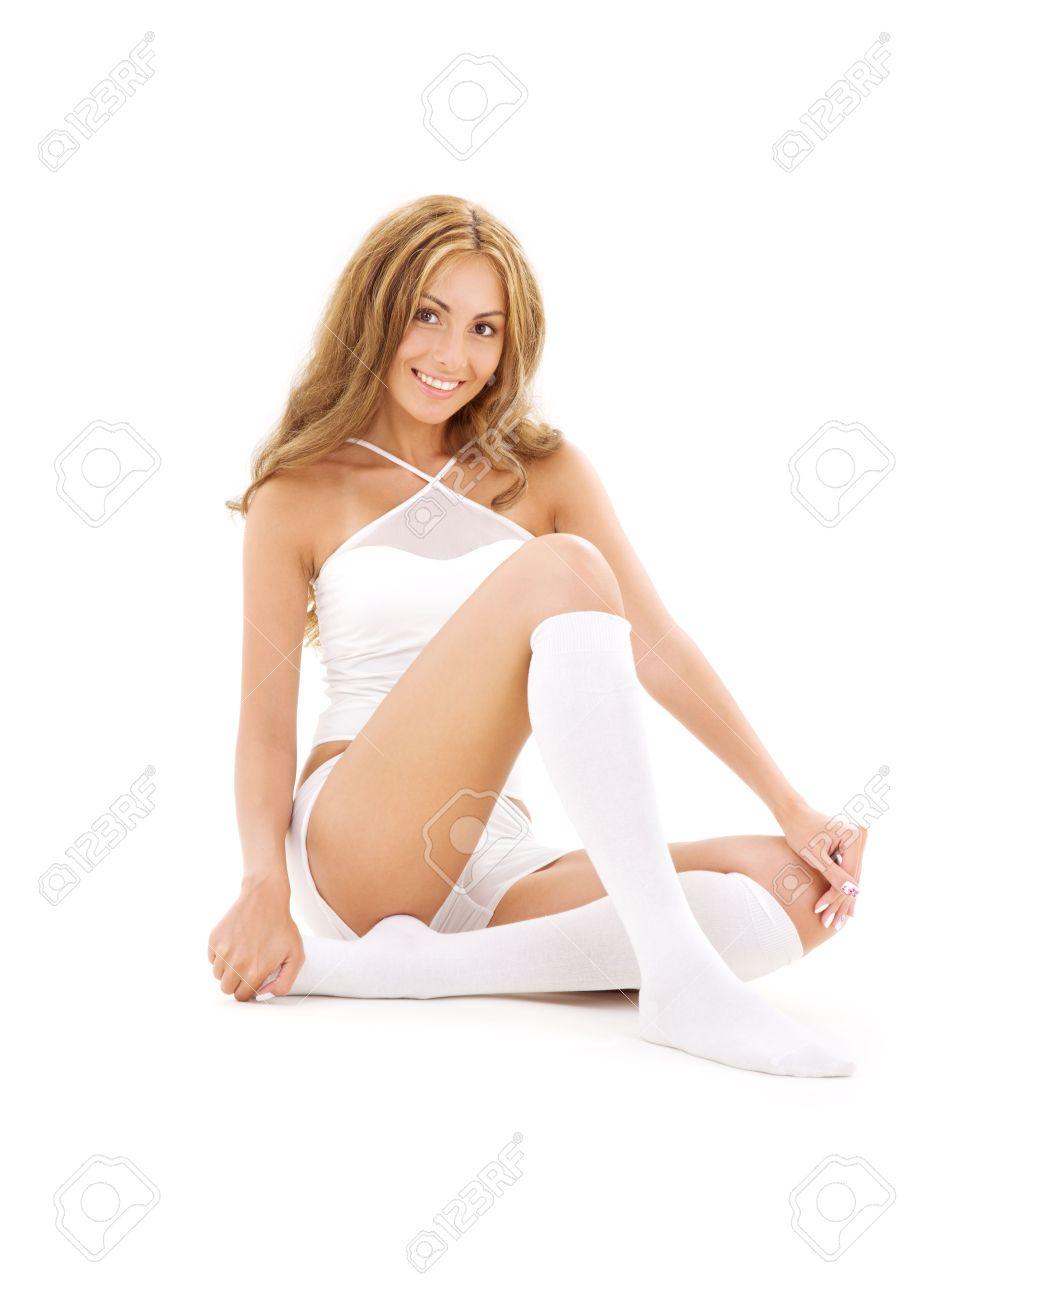 White Socks And Panties